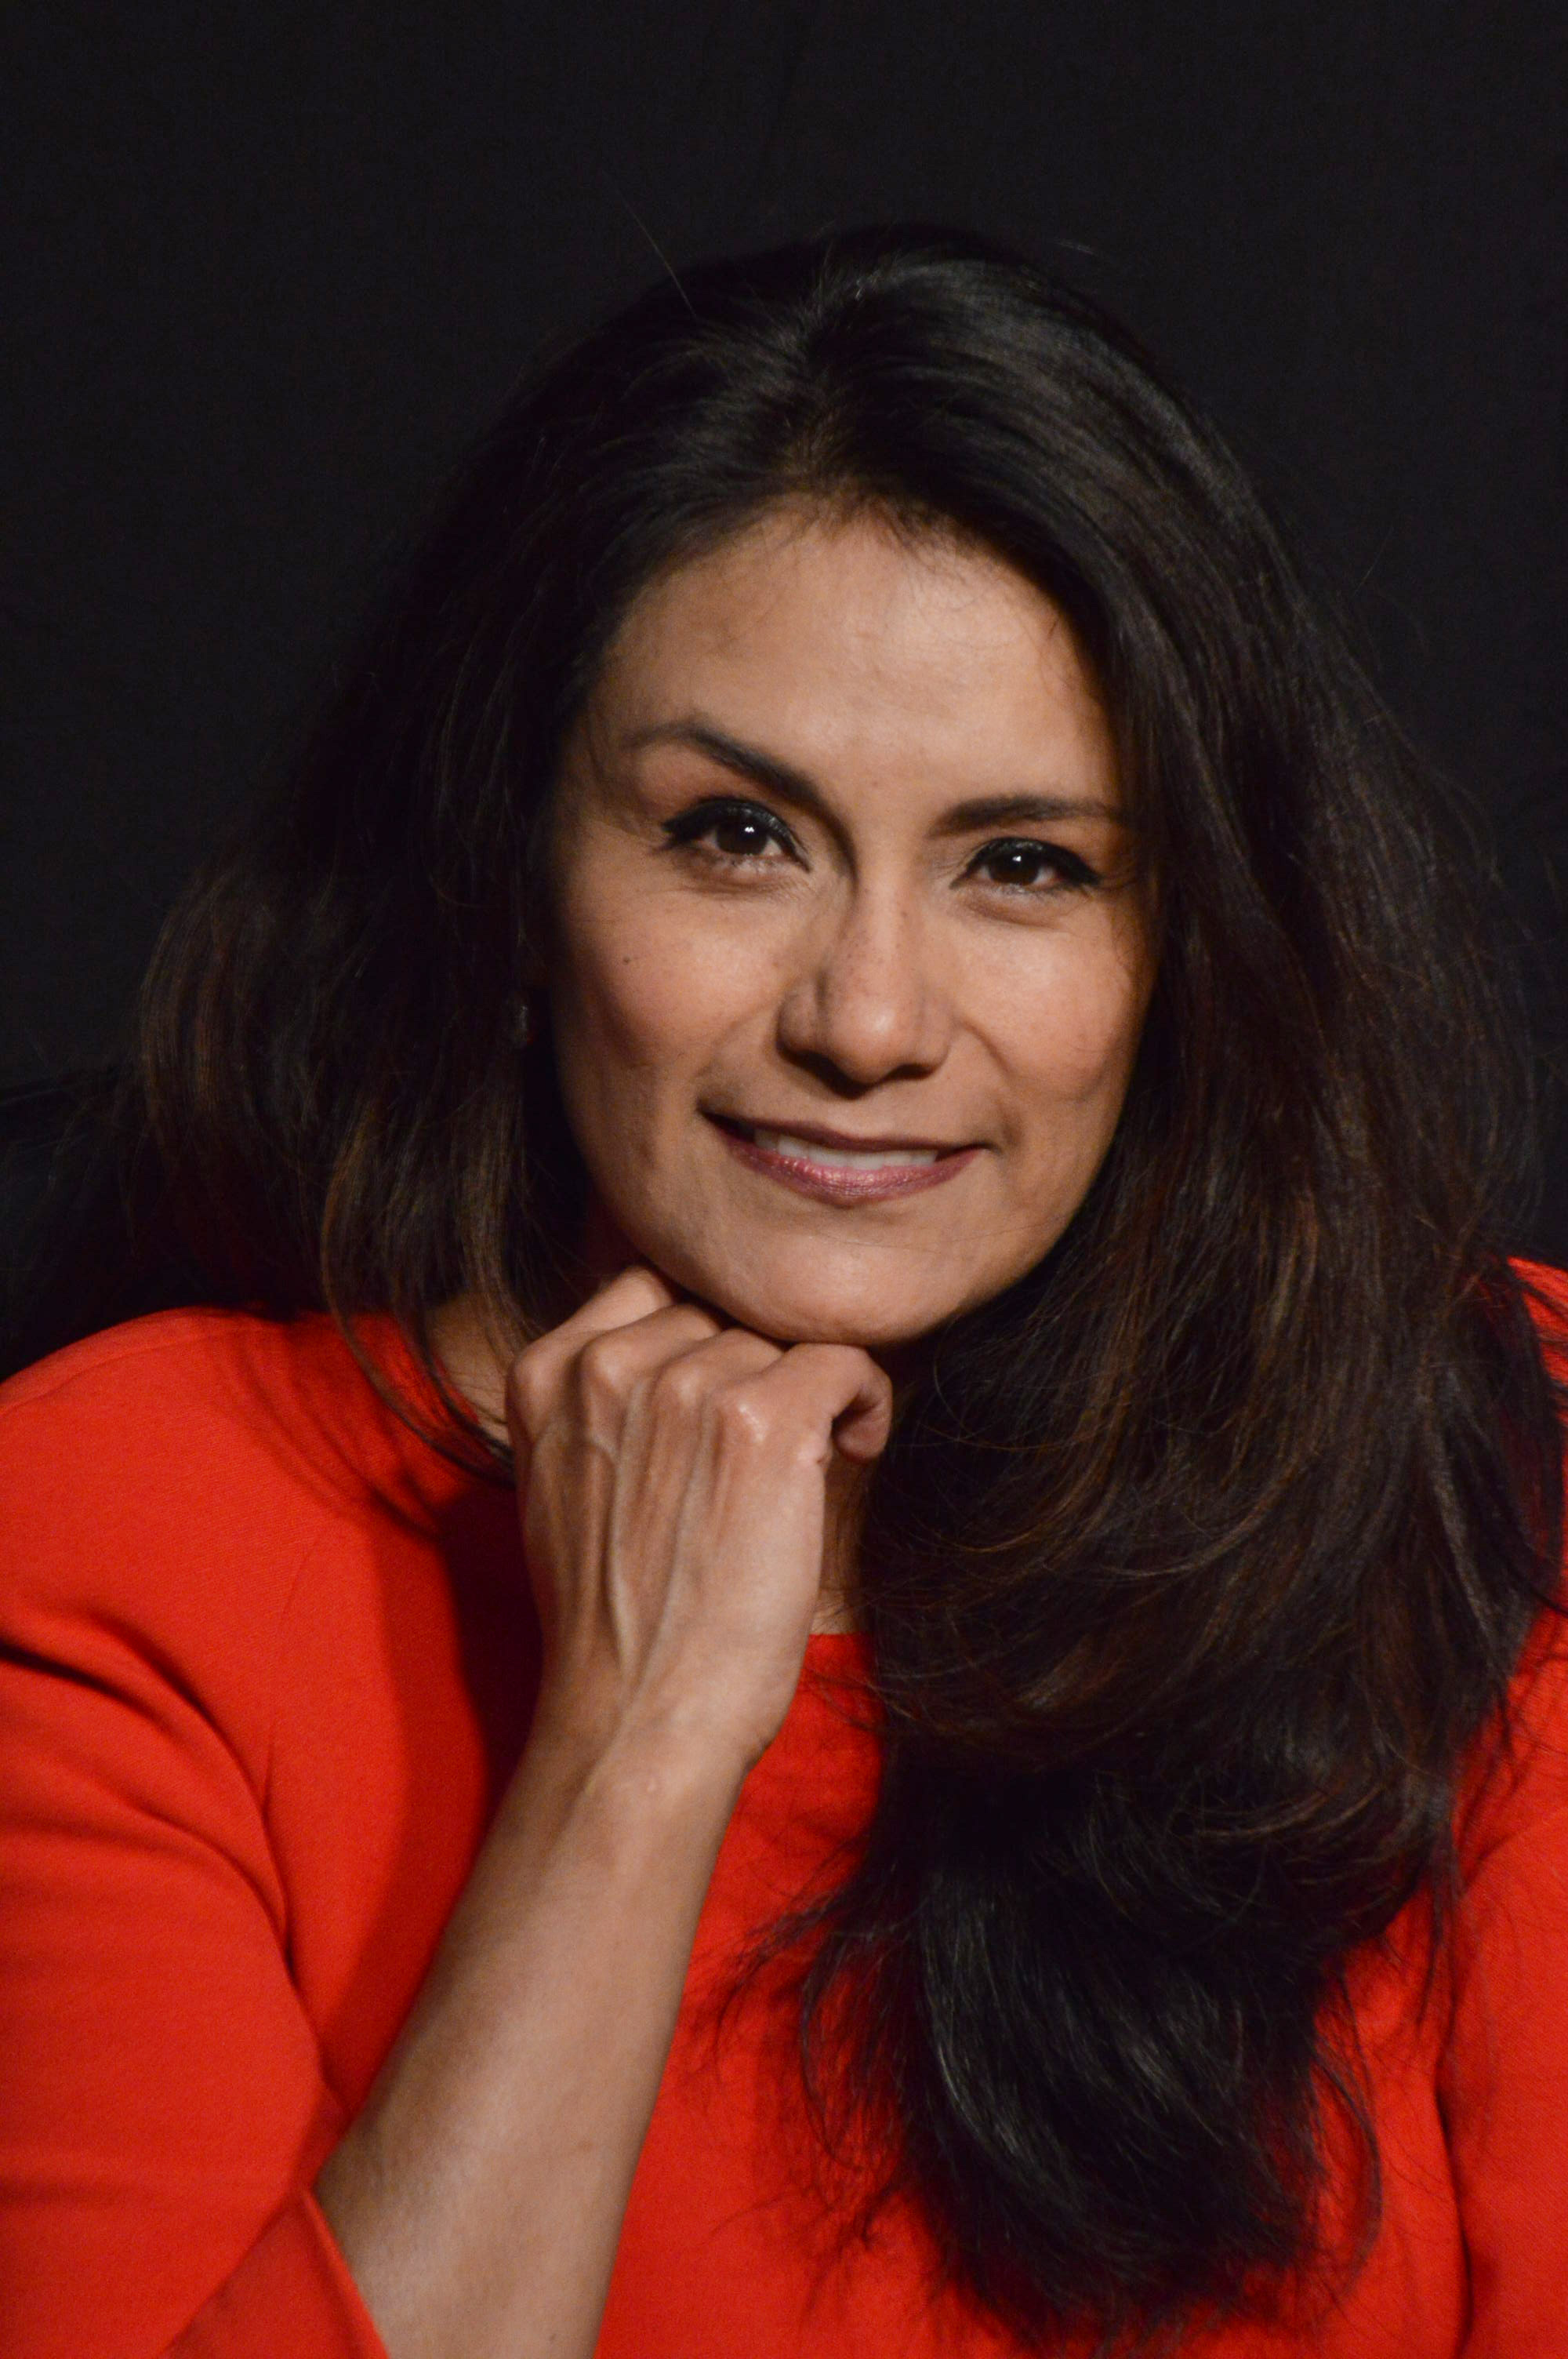 Dra. Medina Ramírez Reyna Carolina Image